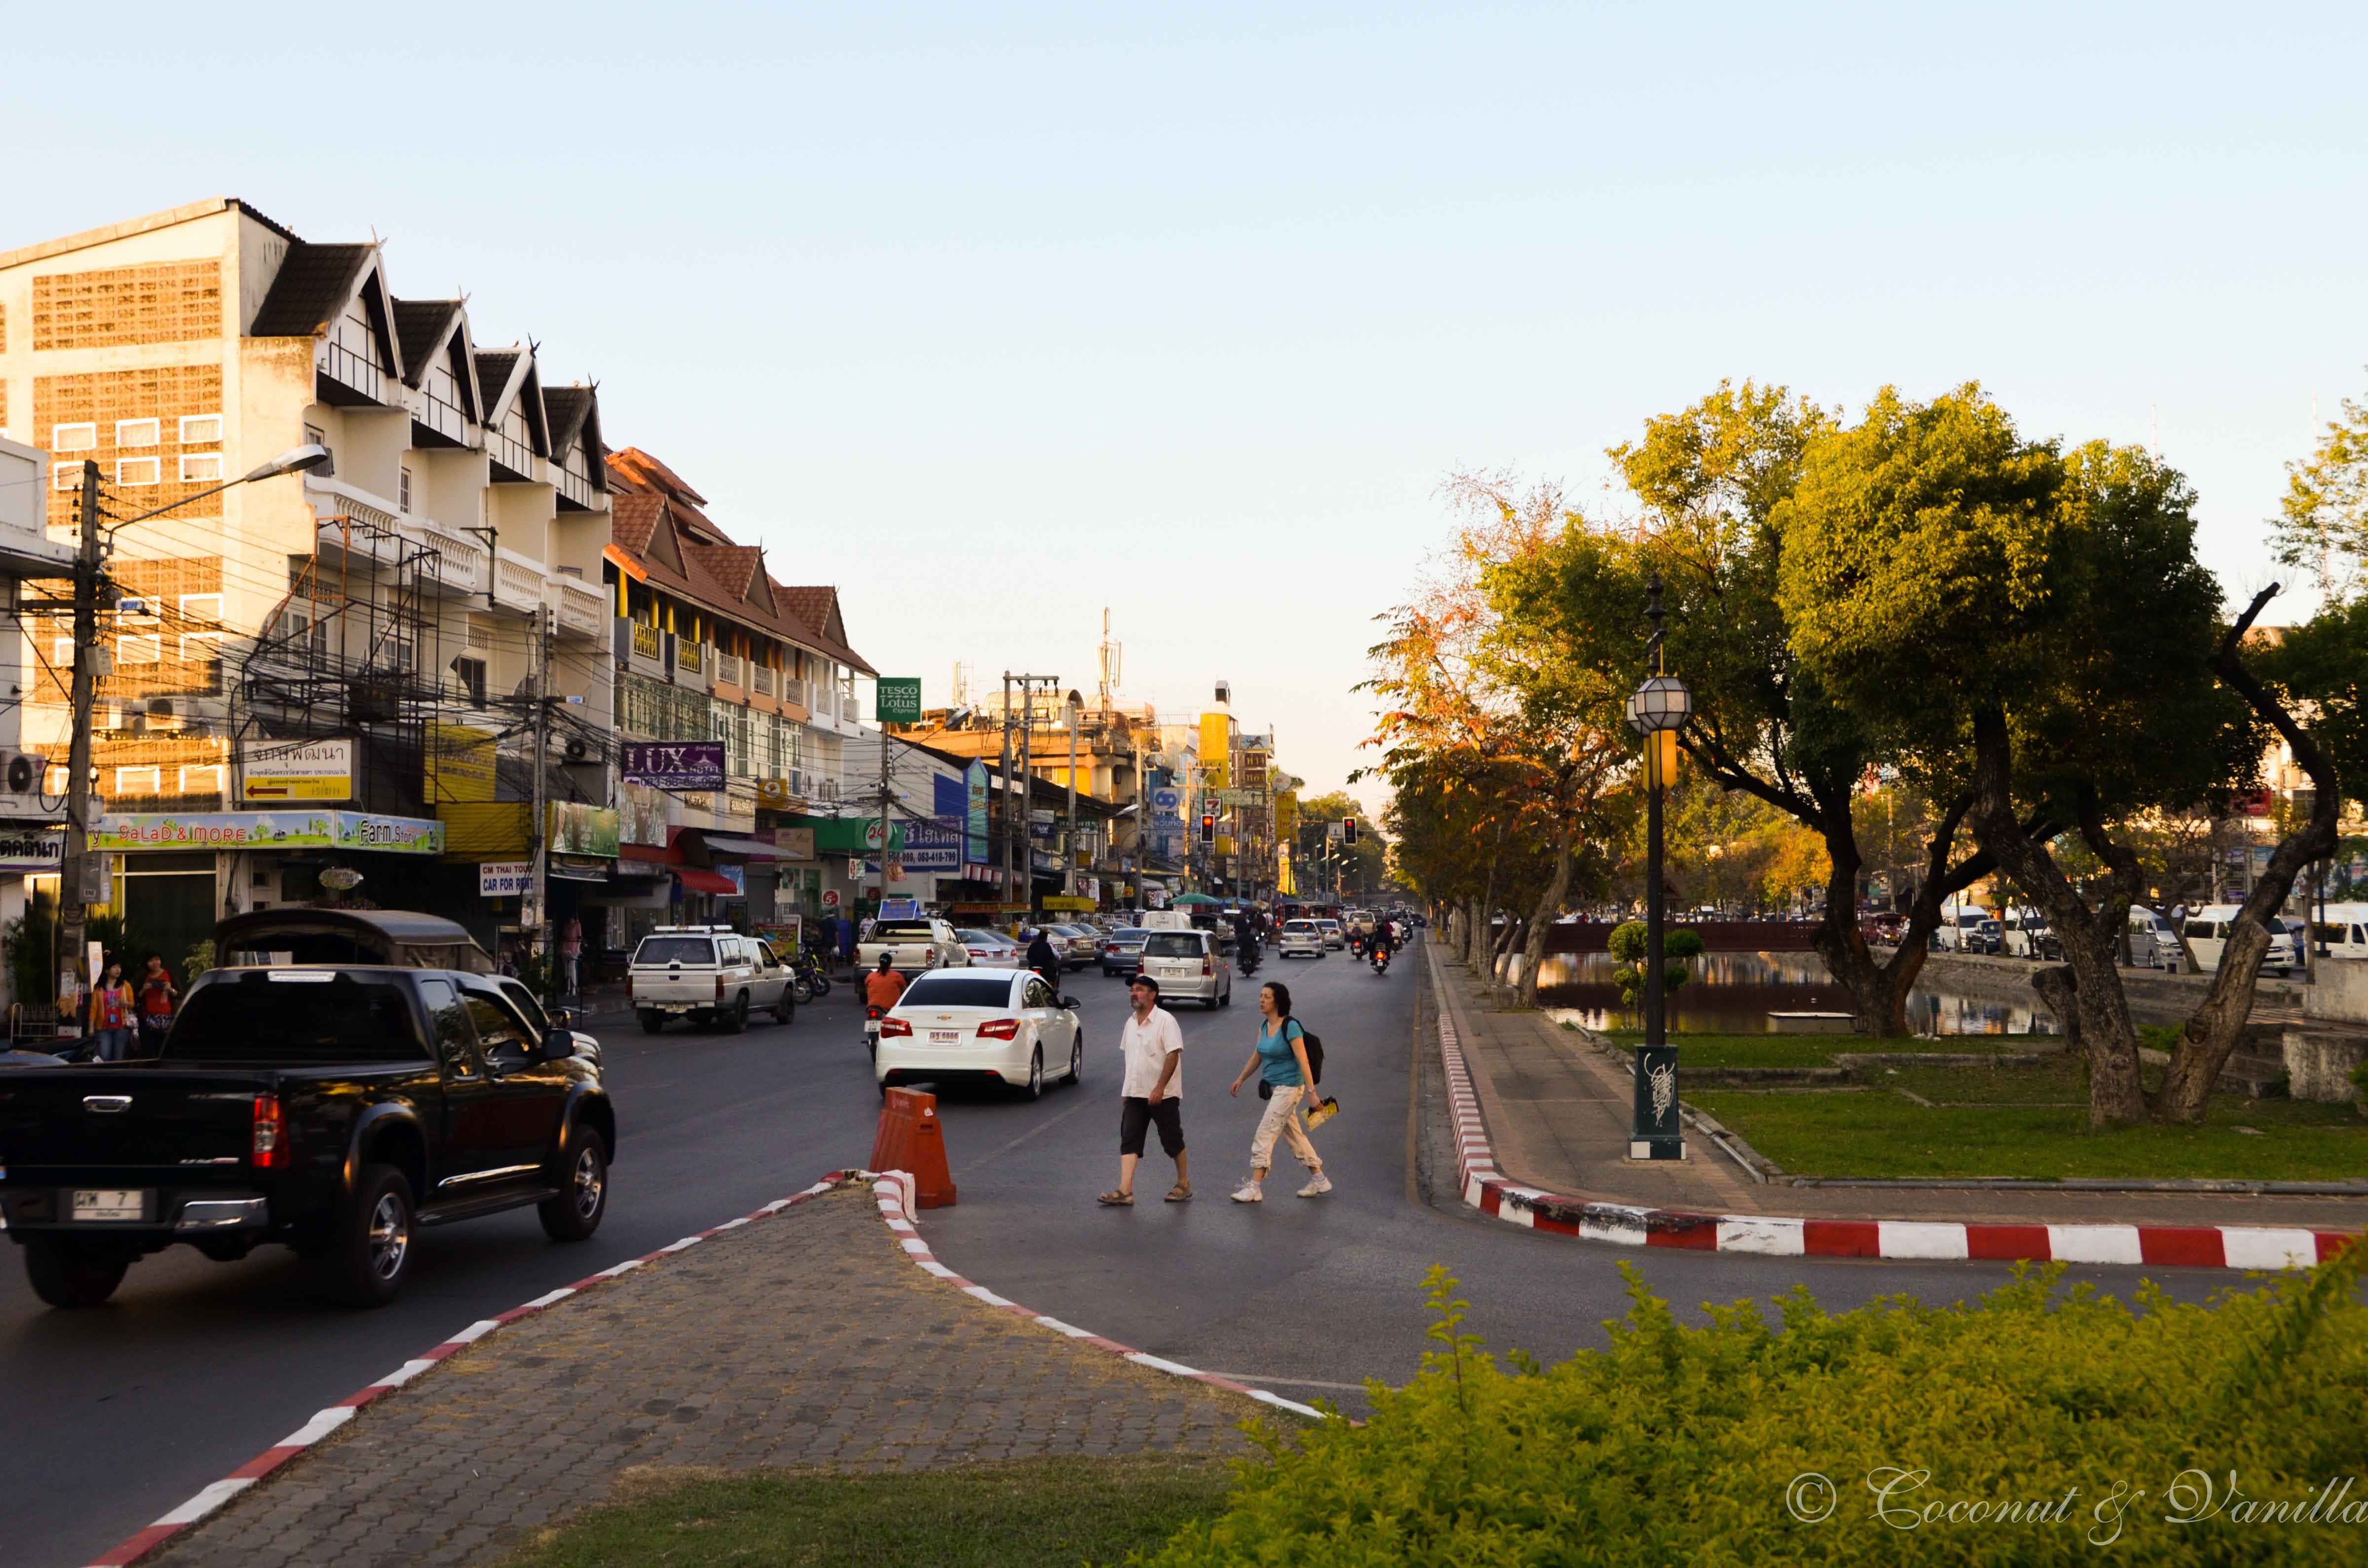 Chiang Mai Thailand by Coconut & Vanilla